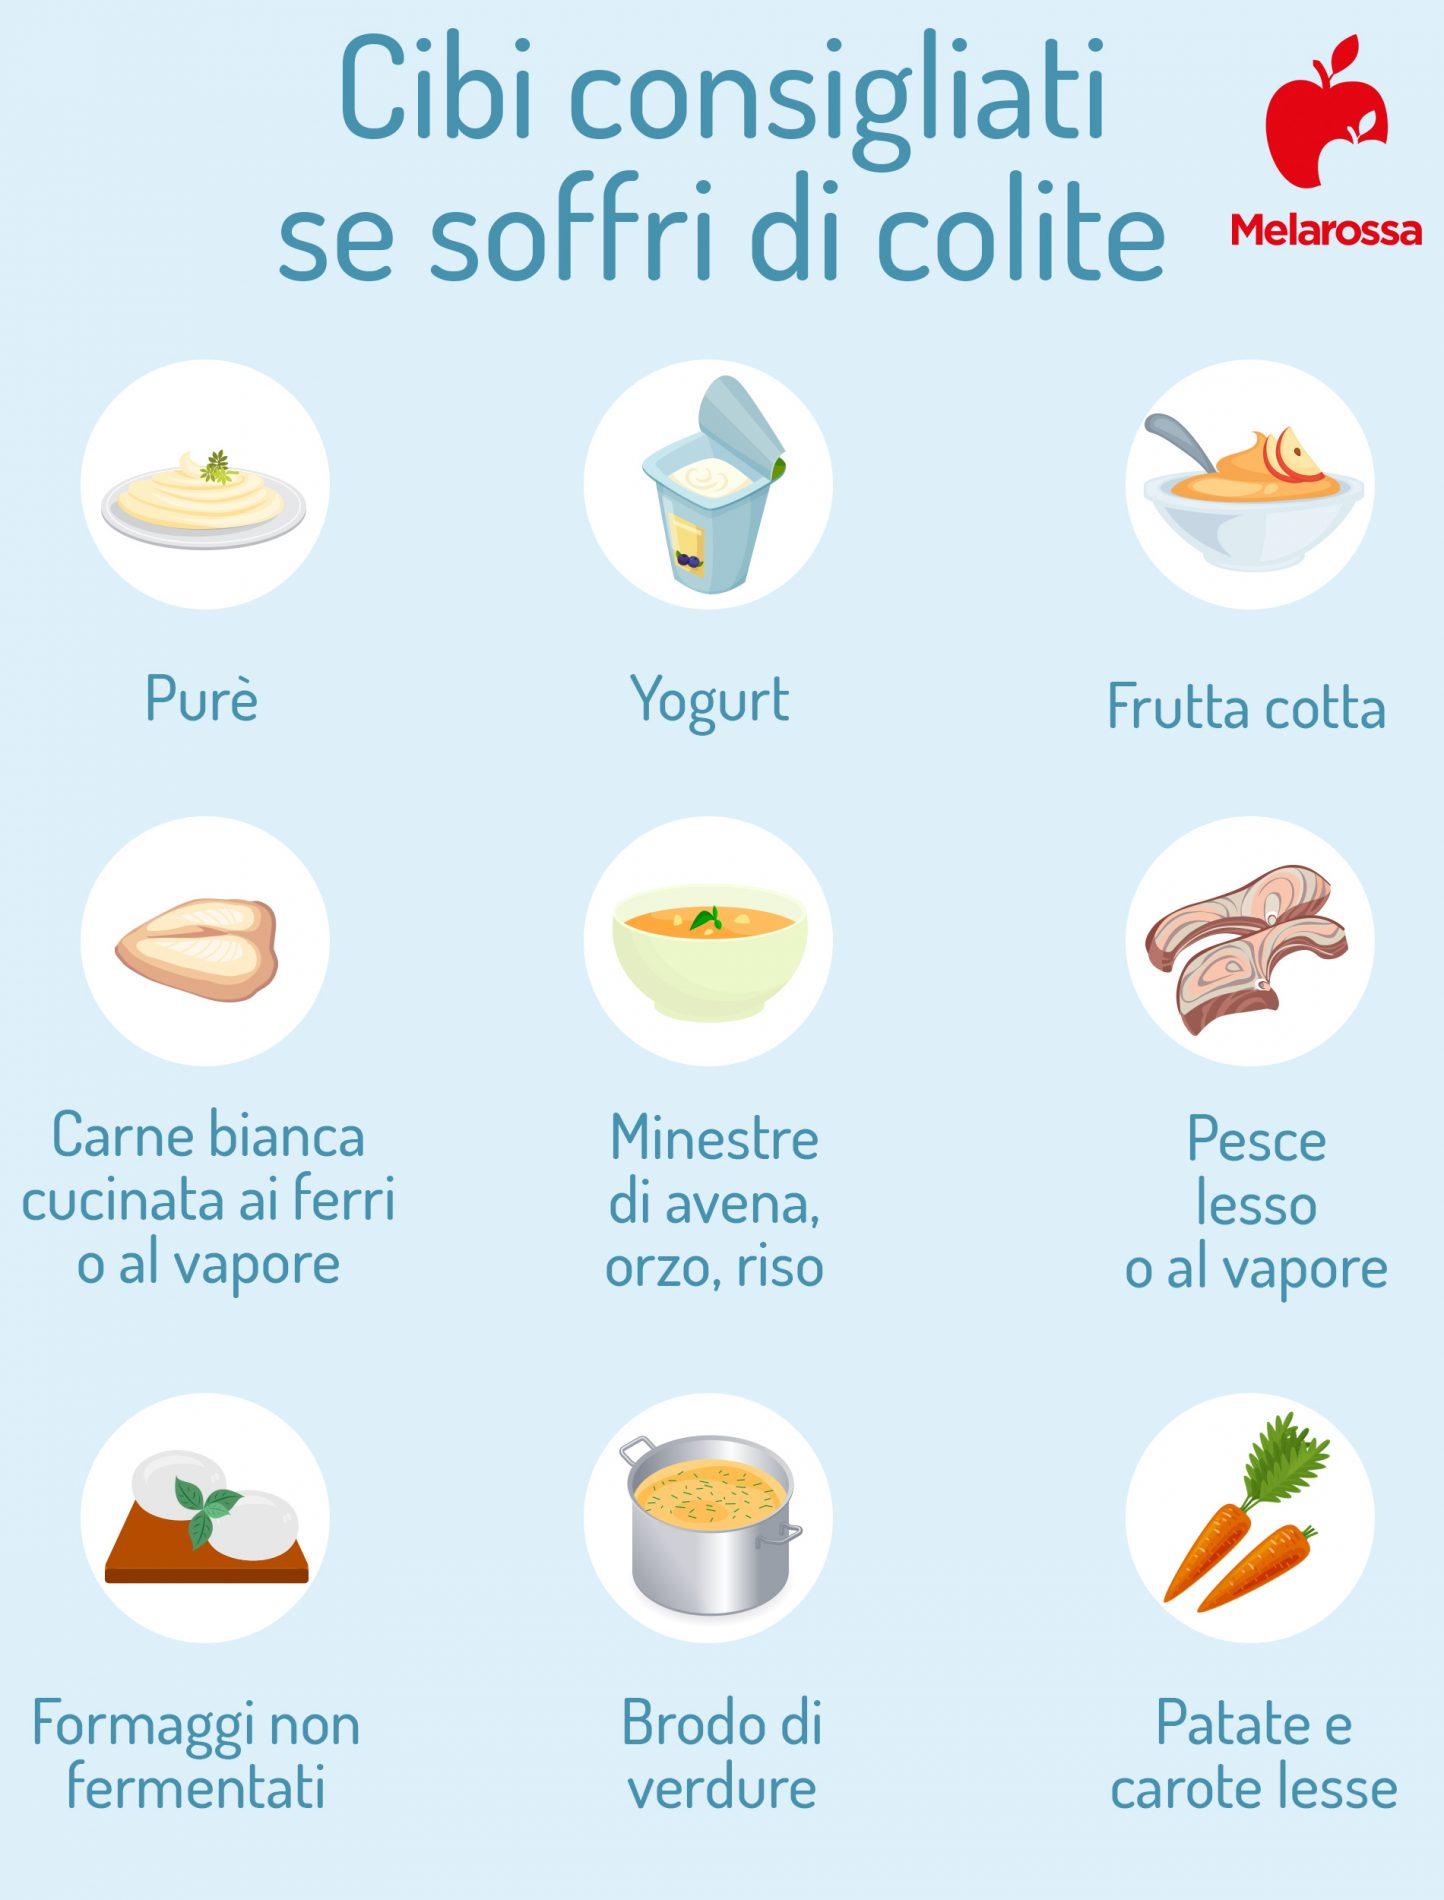 Colitis: alimentos recomendados